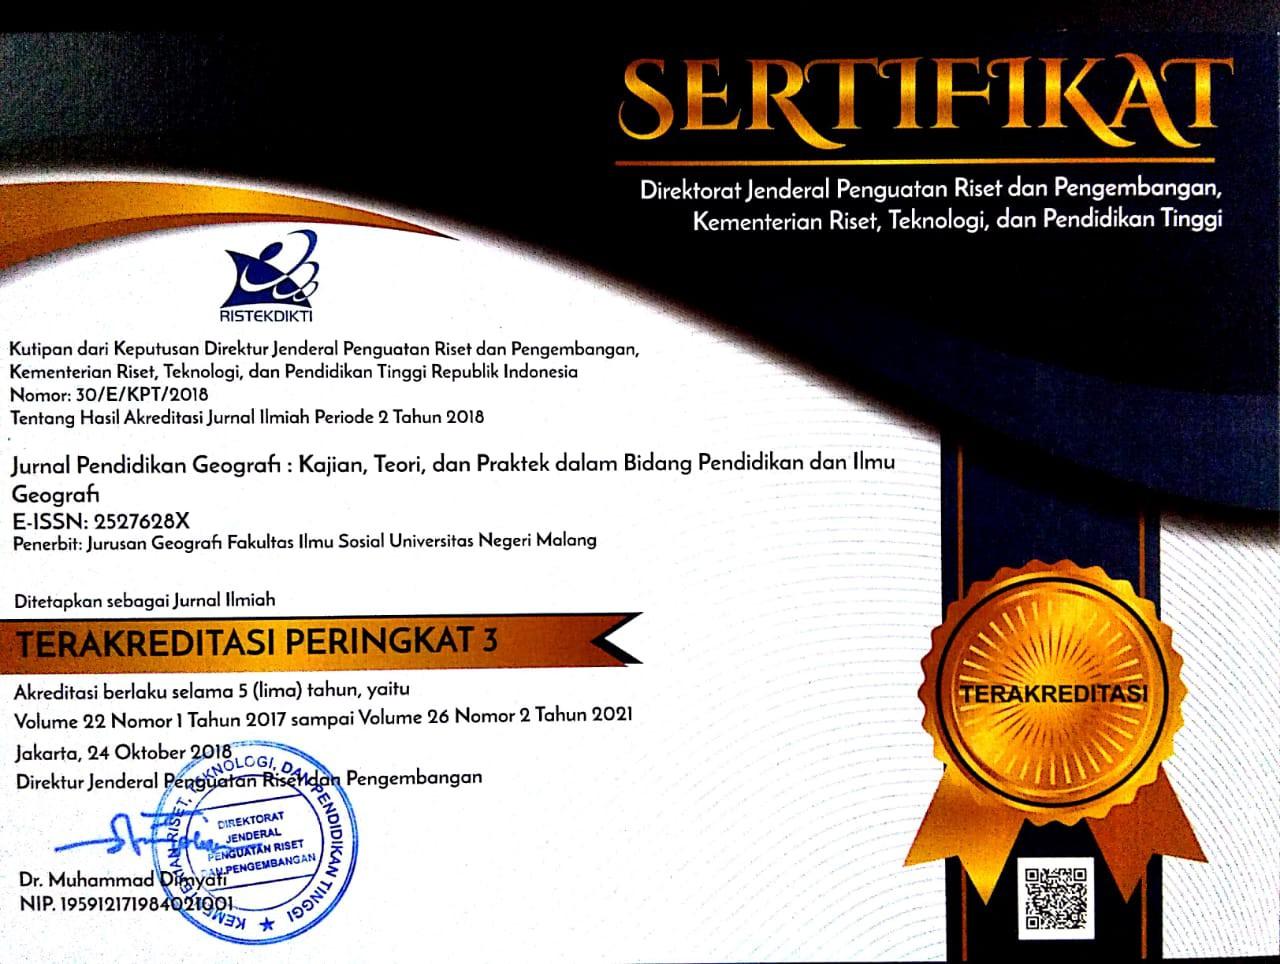 Jurnal Pendidikan Geografi Kajian Teori Dan Praktek Dalam Bidang Pendidikan Dan Ilmu Geografi